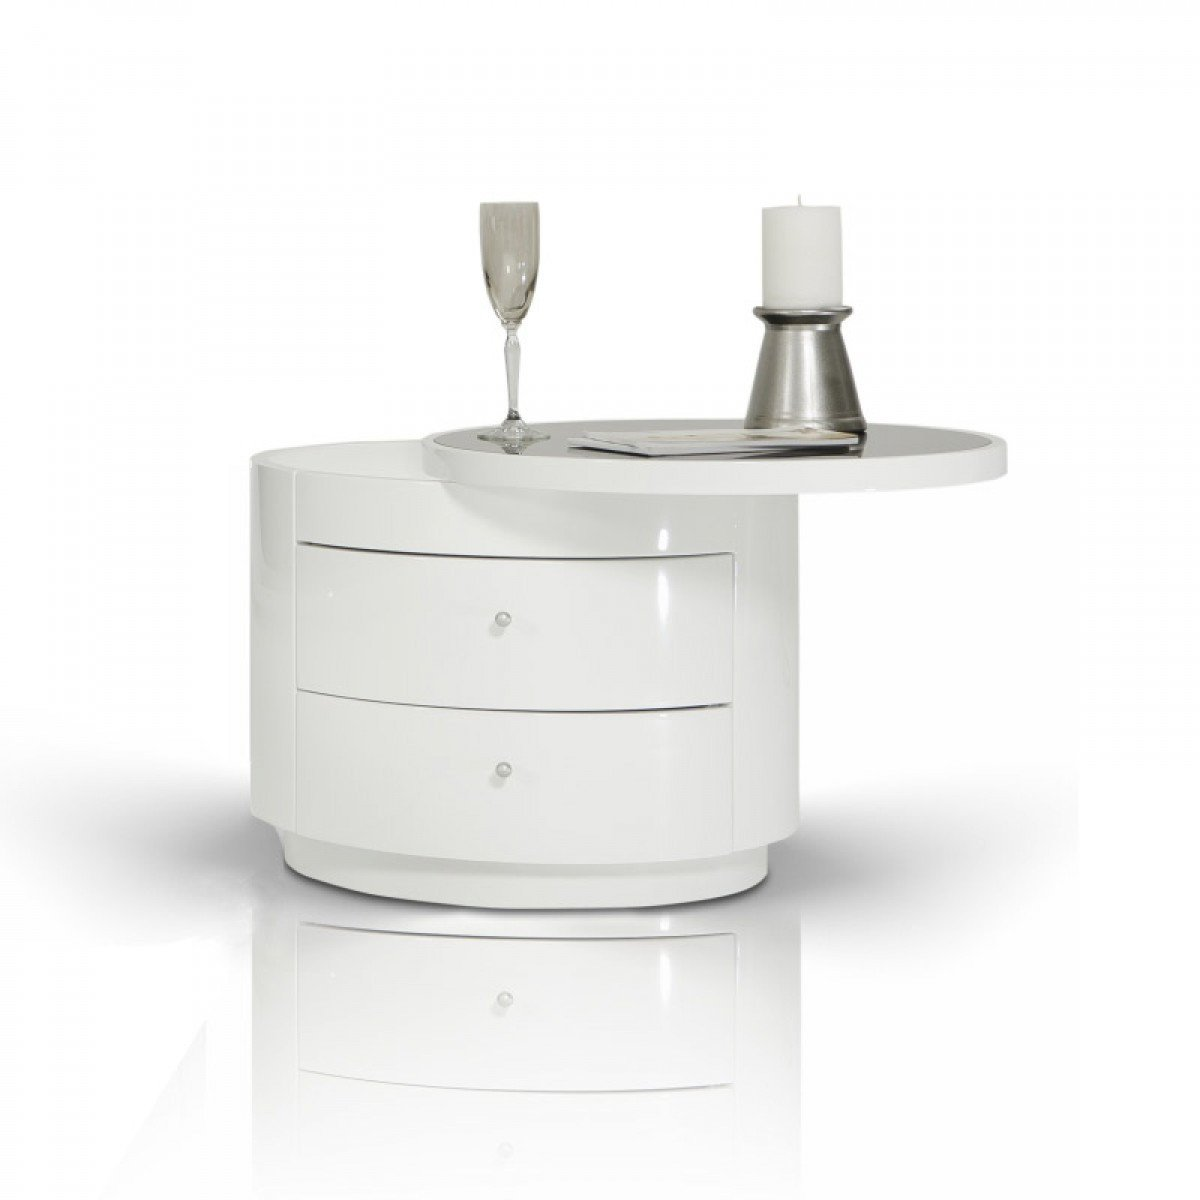 Modrest Symphony Modern White Round Nightstand 2 Drawer Nightstands